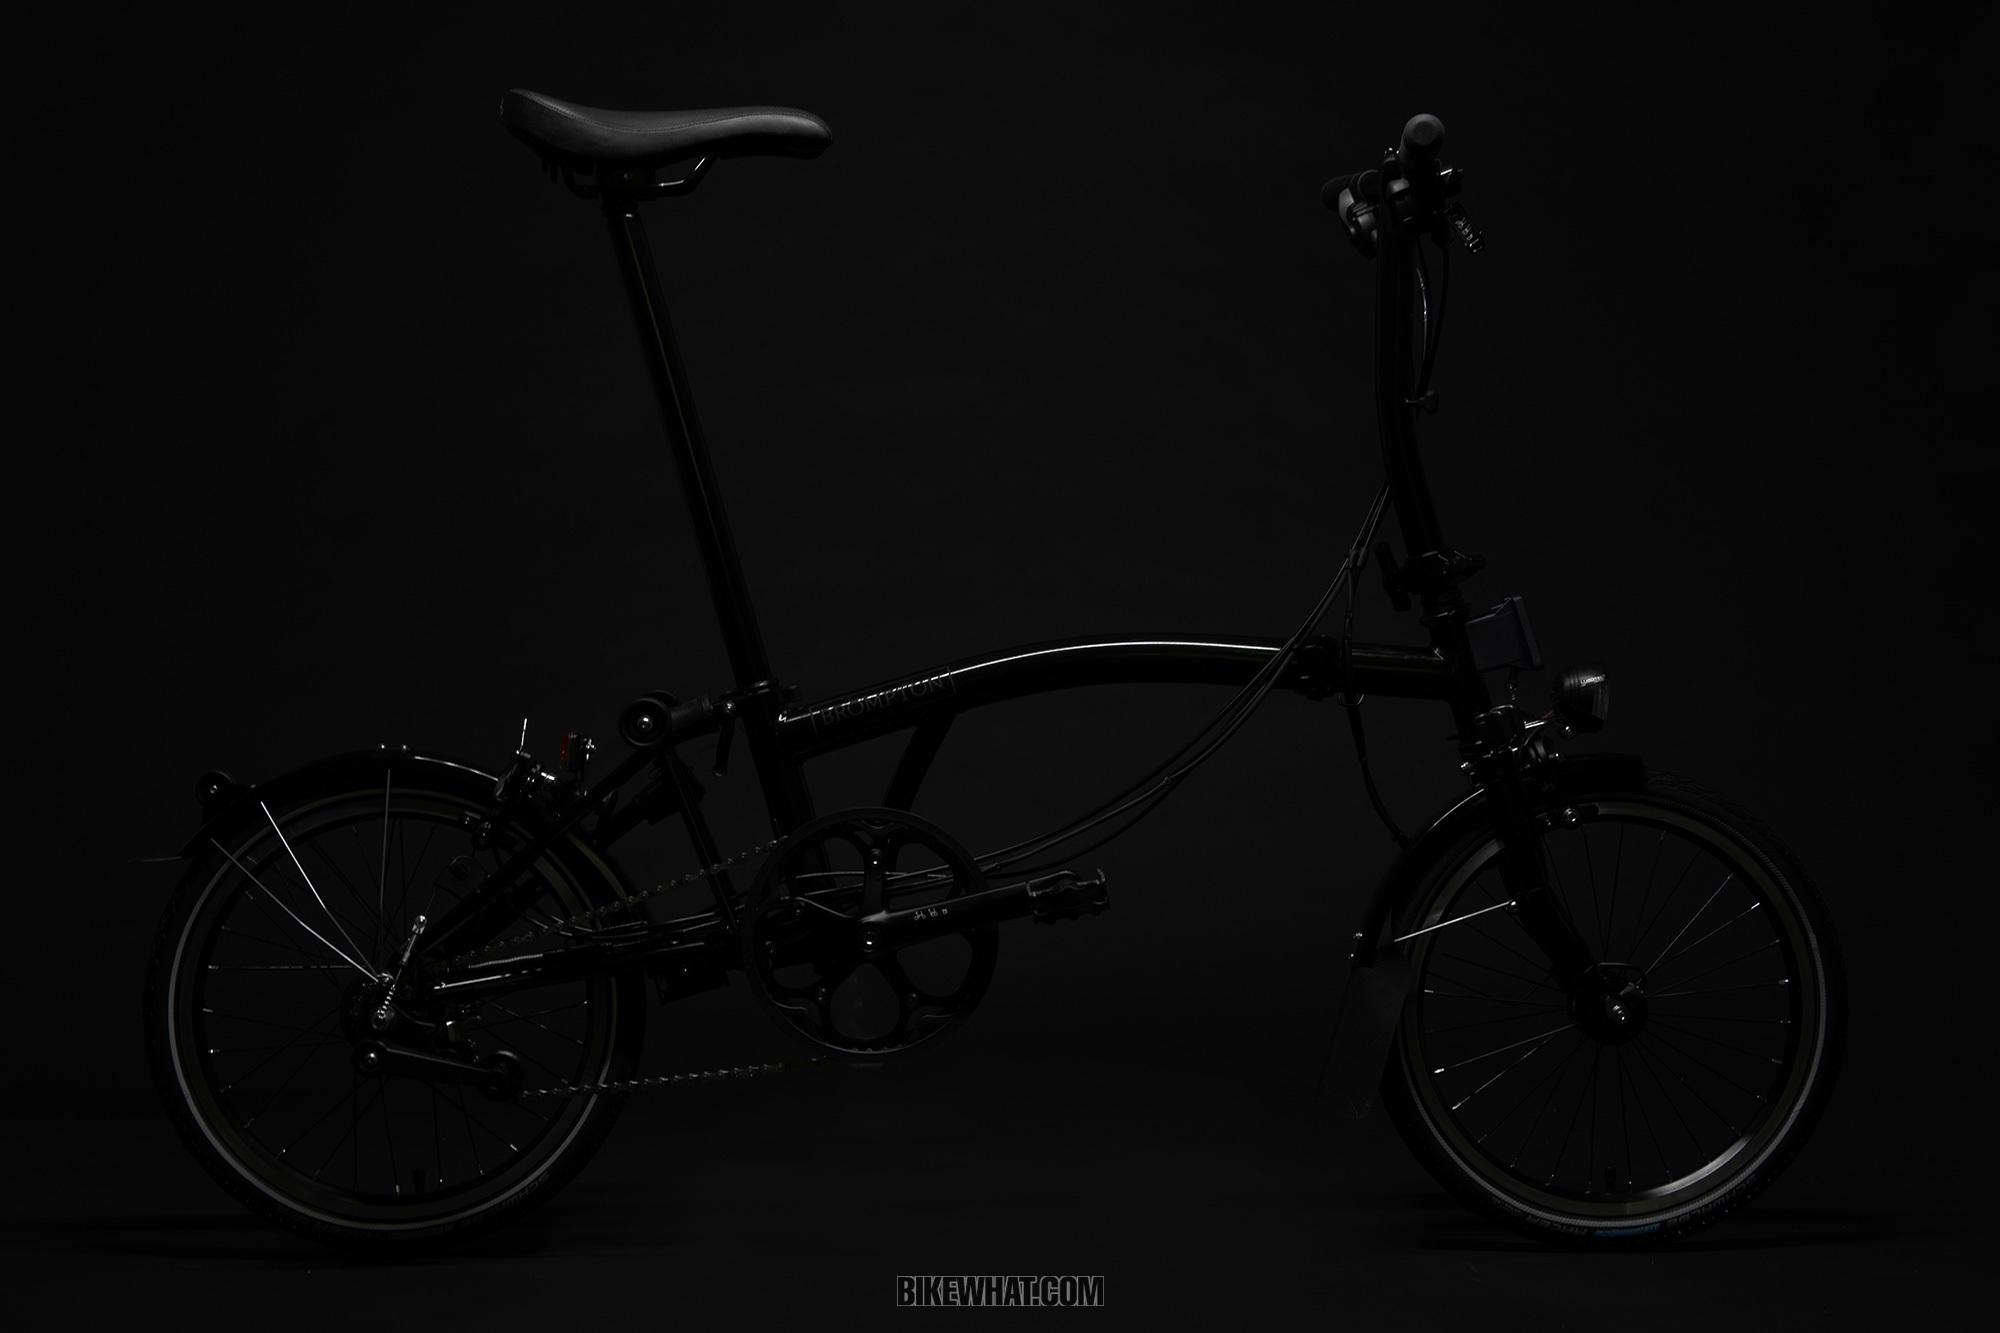 gear_Brompton_black_edition_S6L_BK.jpg